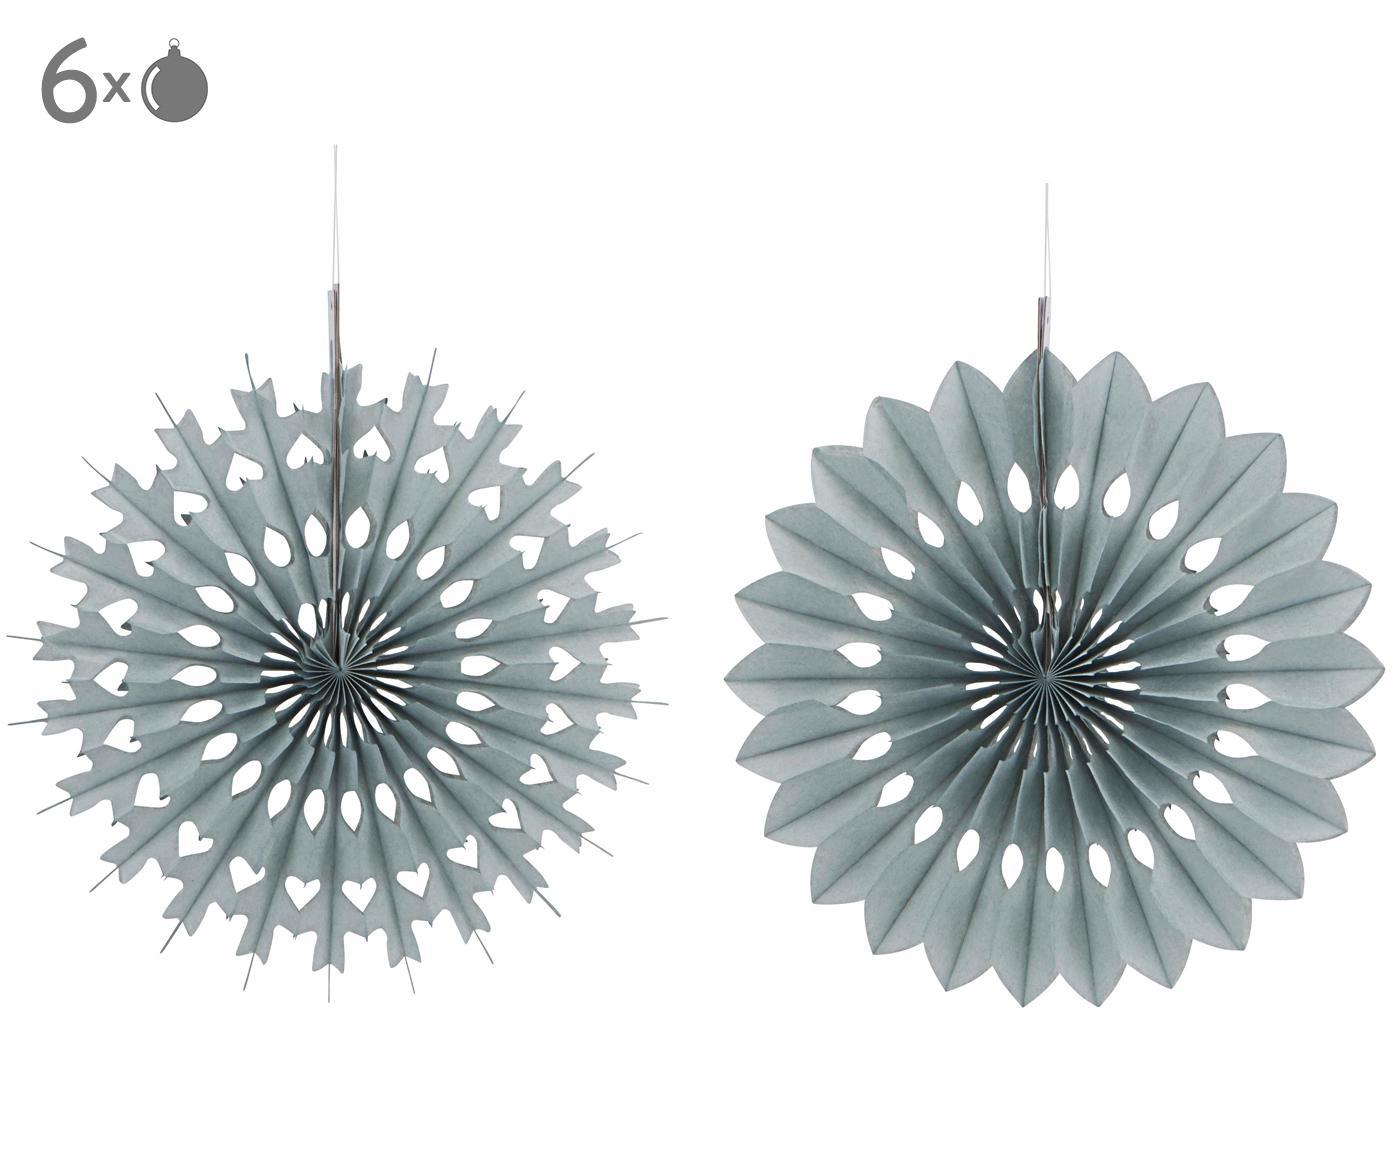 Decoratieve hangersset Cuta, 6-delig, Papier, Grijs, Ø 20 cm